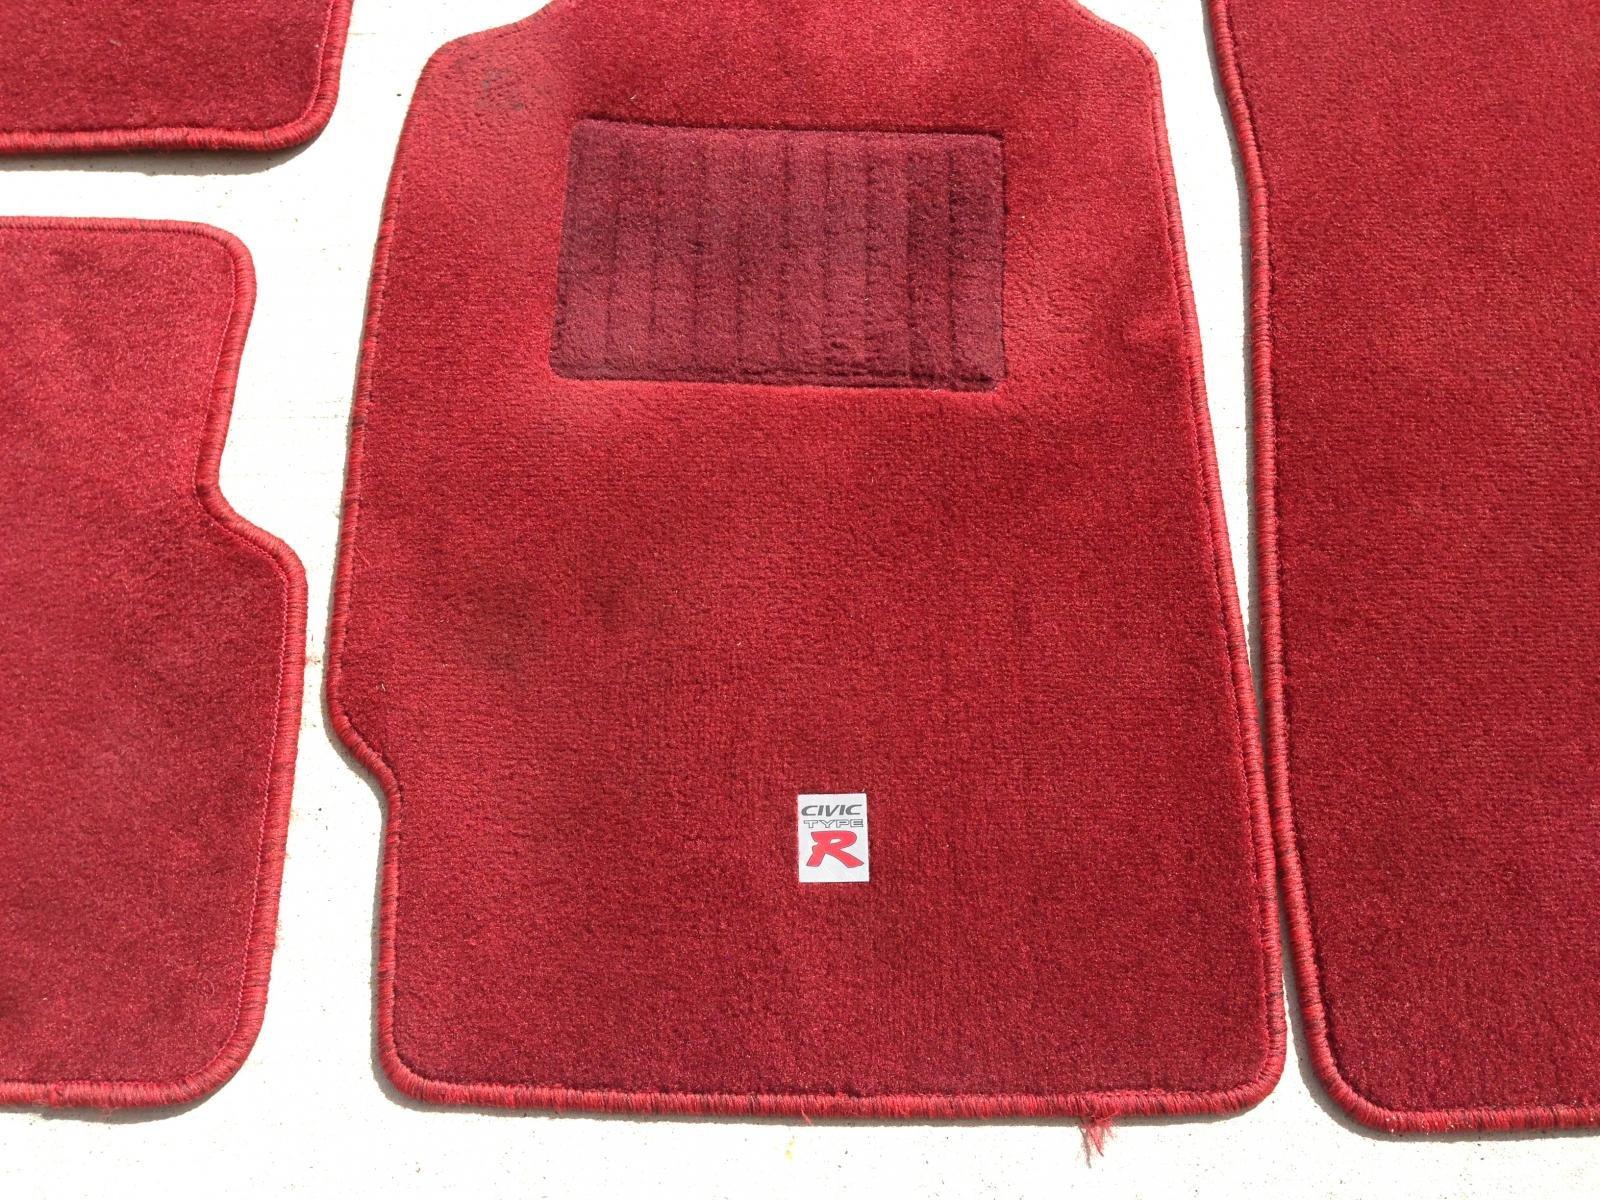 Floor mats for honda civic -  Civic Type R Floor Mats Red Photo 6 Jpg